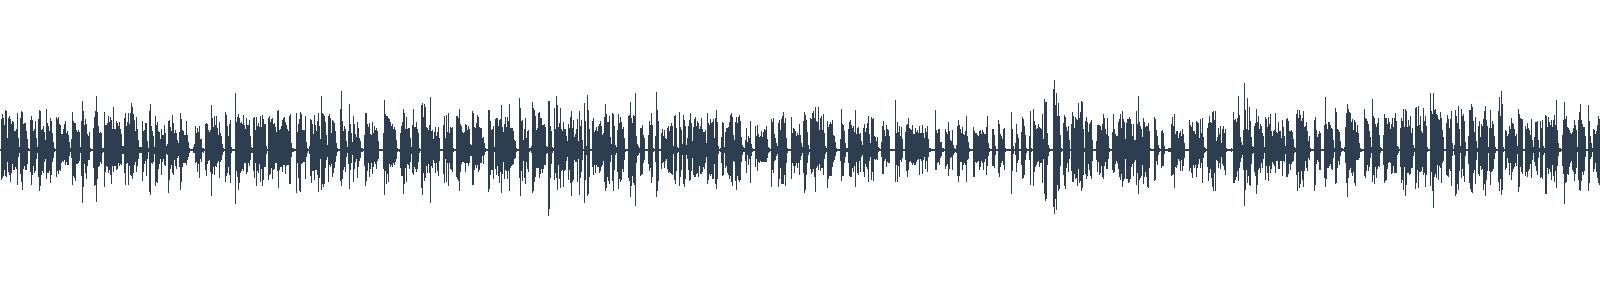 Netočka Nezvanovová waveform